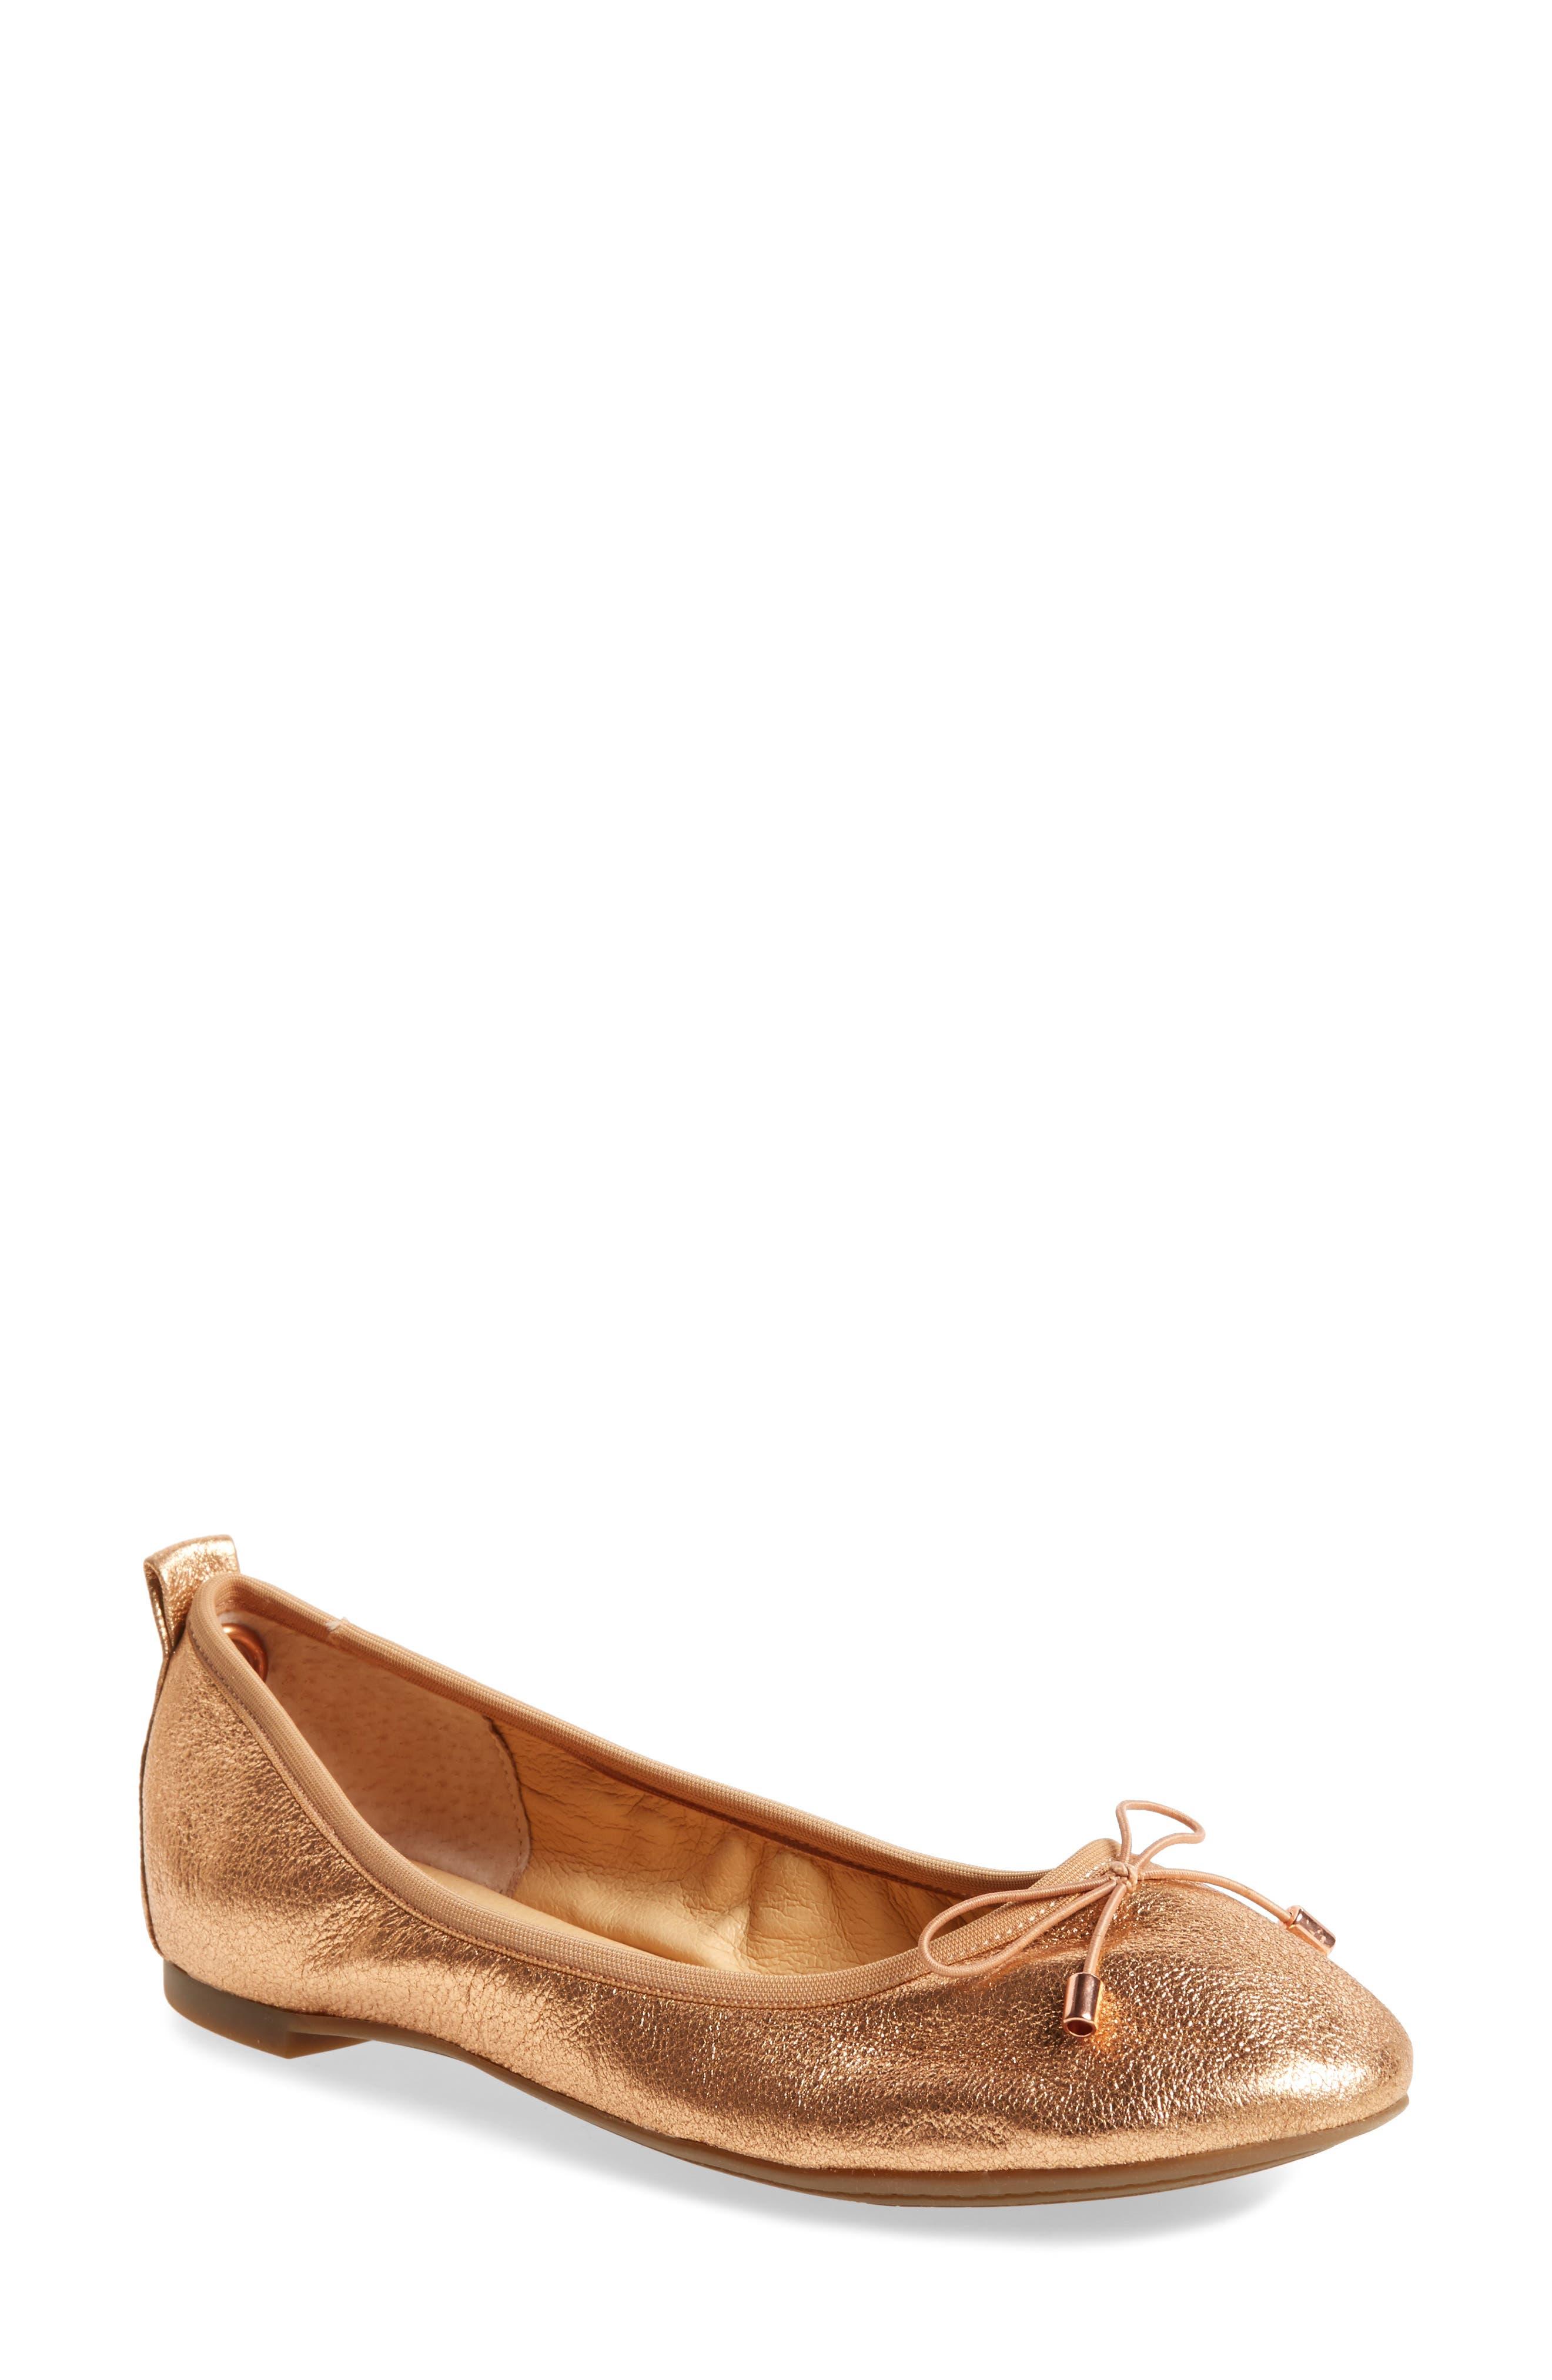 Main Image - Jessica Simpson Nalan Ballet Flat (Women)